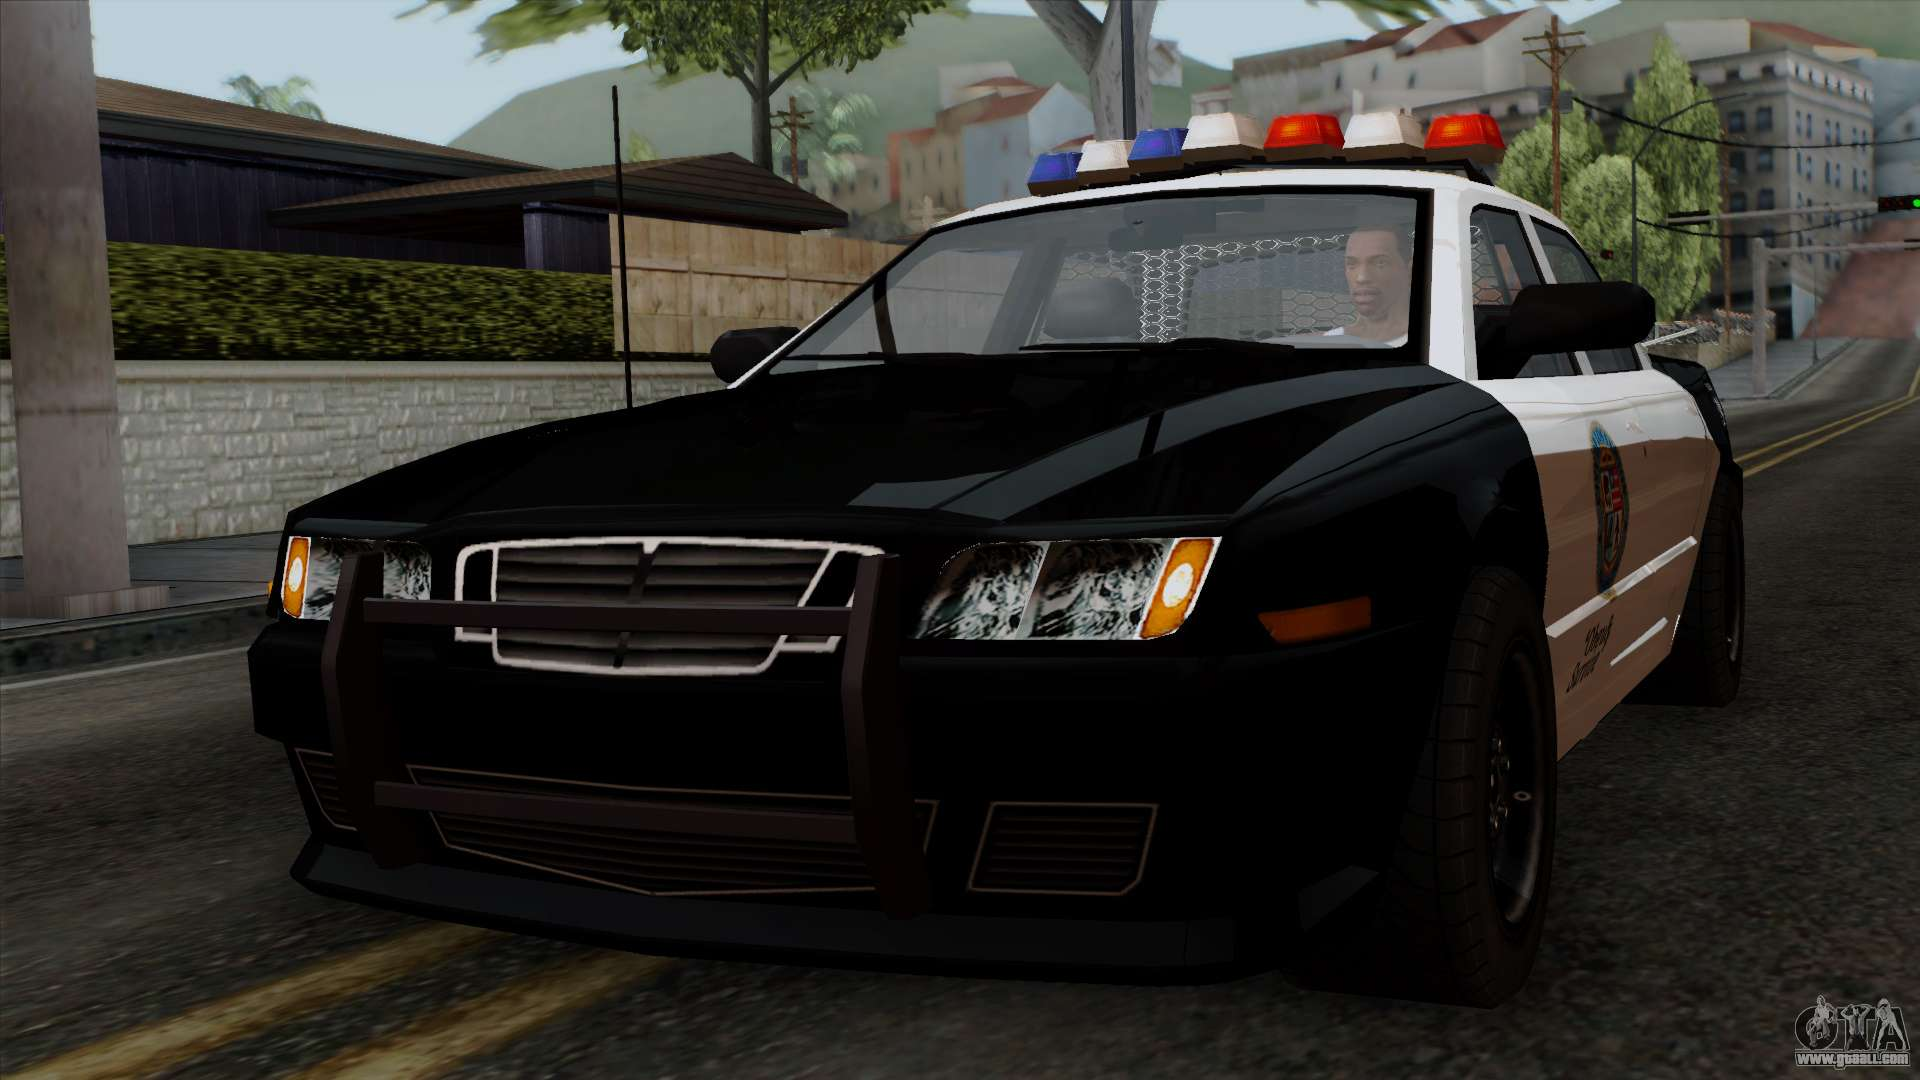 gta 5 ls police car for gta san andreas - Gta 5 Police Cars